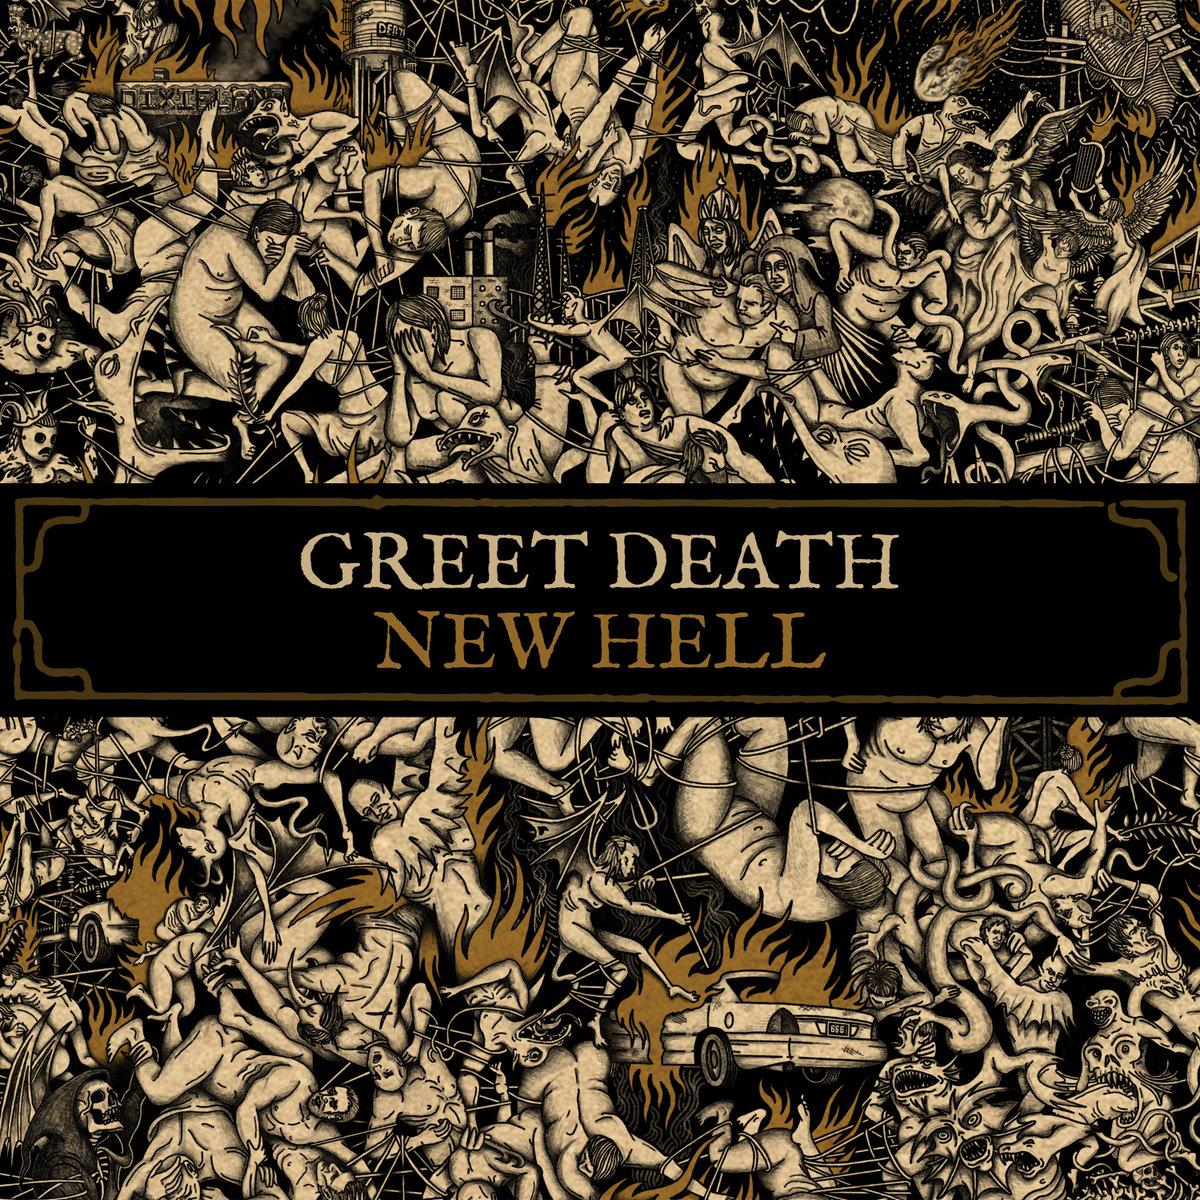 greet-death-new-hell